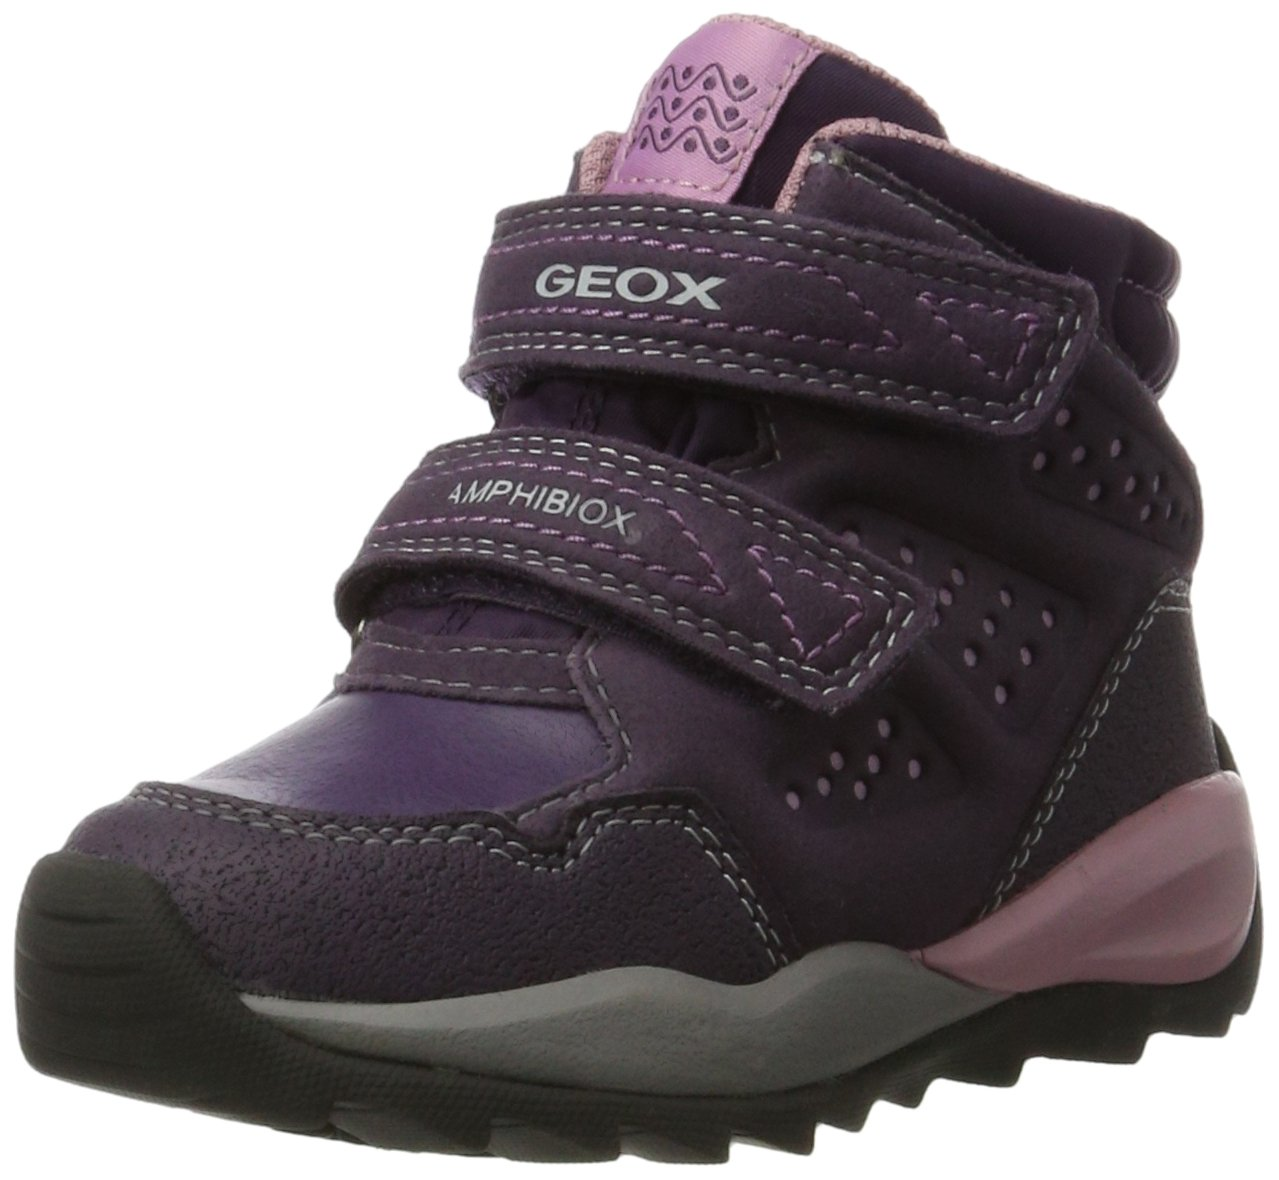 Geox Junior Orizont - J742BF0AUCEC8015 - Color Violet - Size: 12.0 by Geox